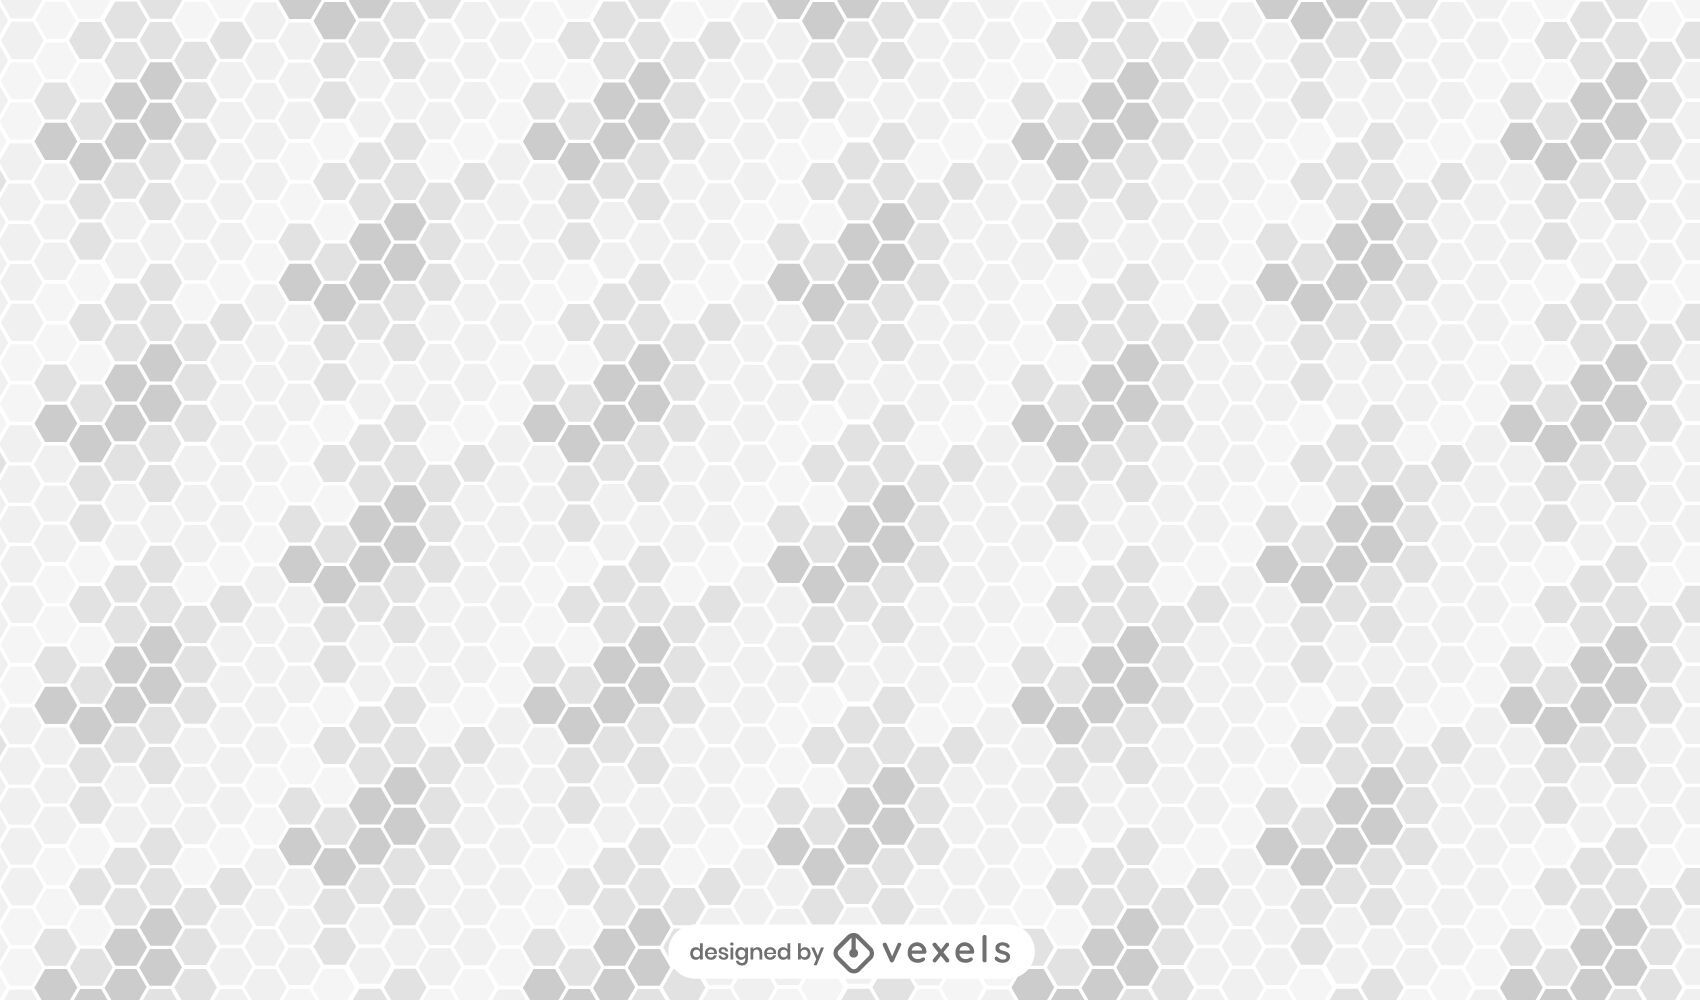 Honeycomb gradient gray pattern